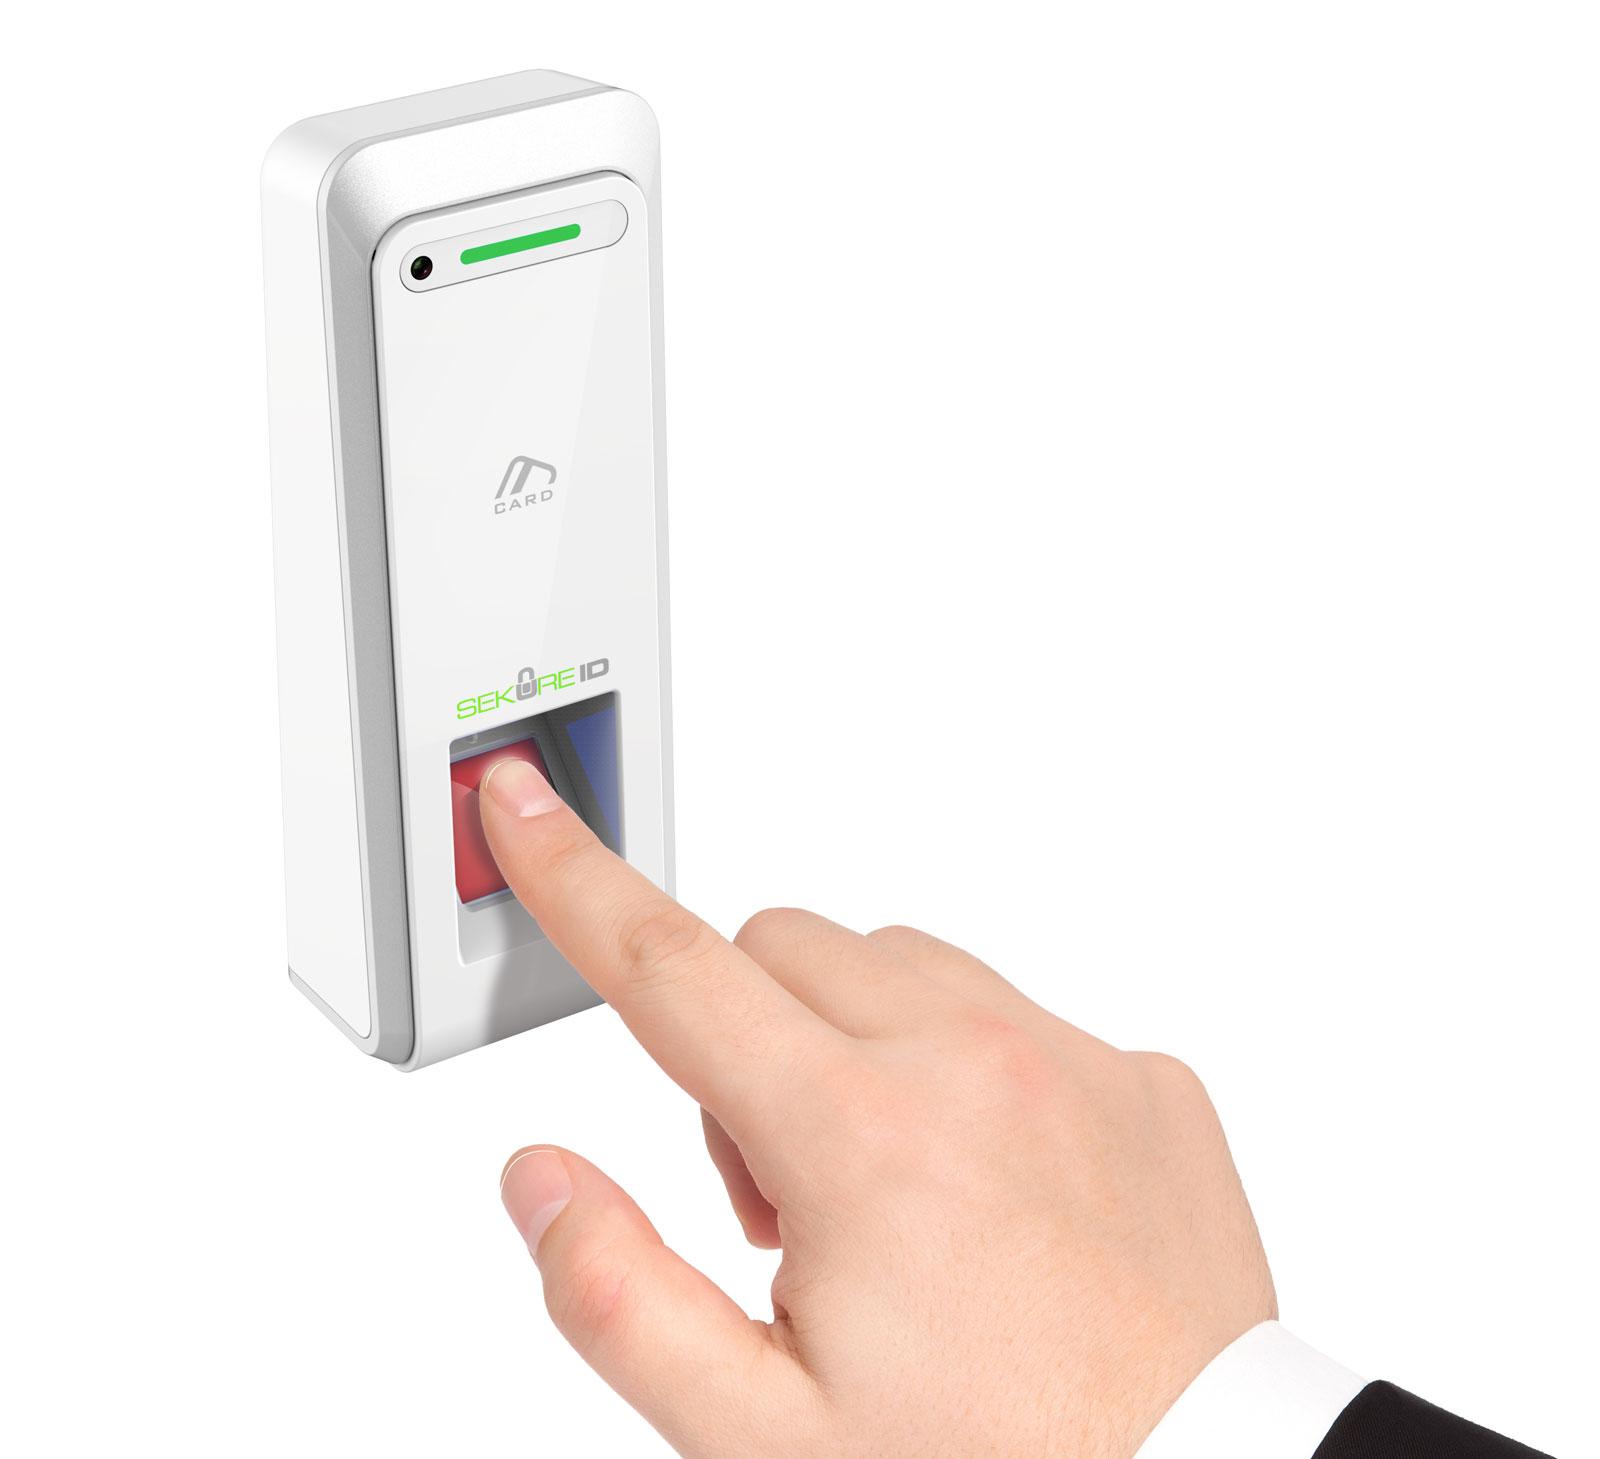 Xenio AC-200 Smart Fingerprint Terminal powered by SekureID